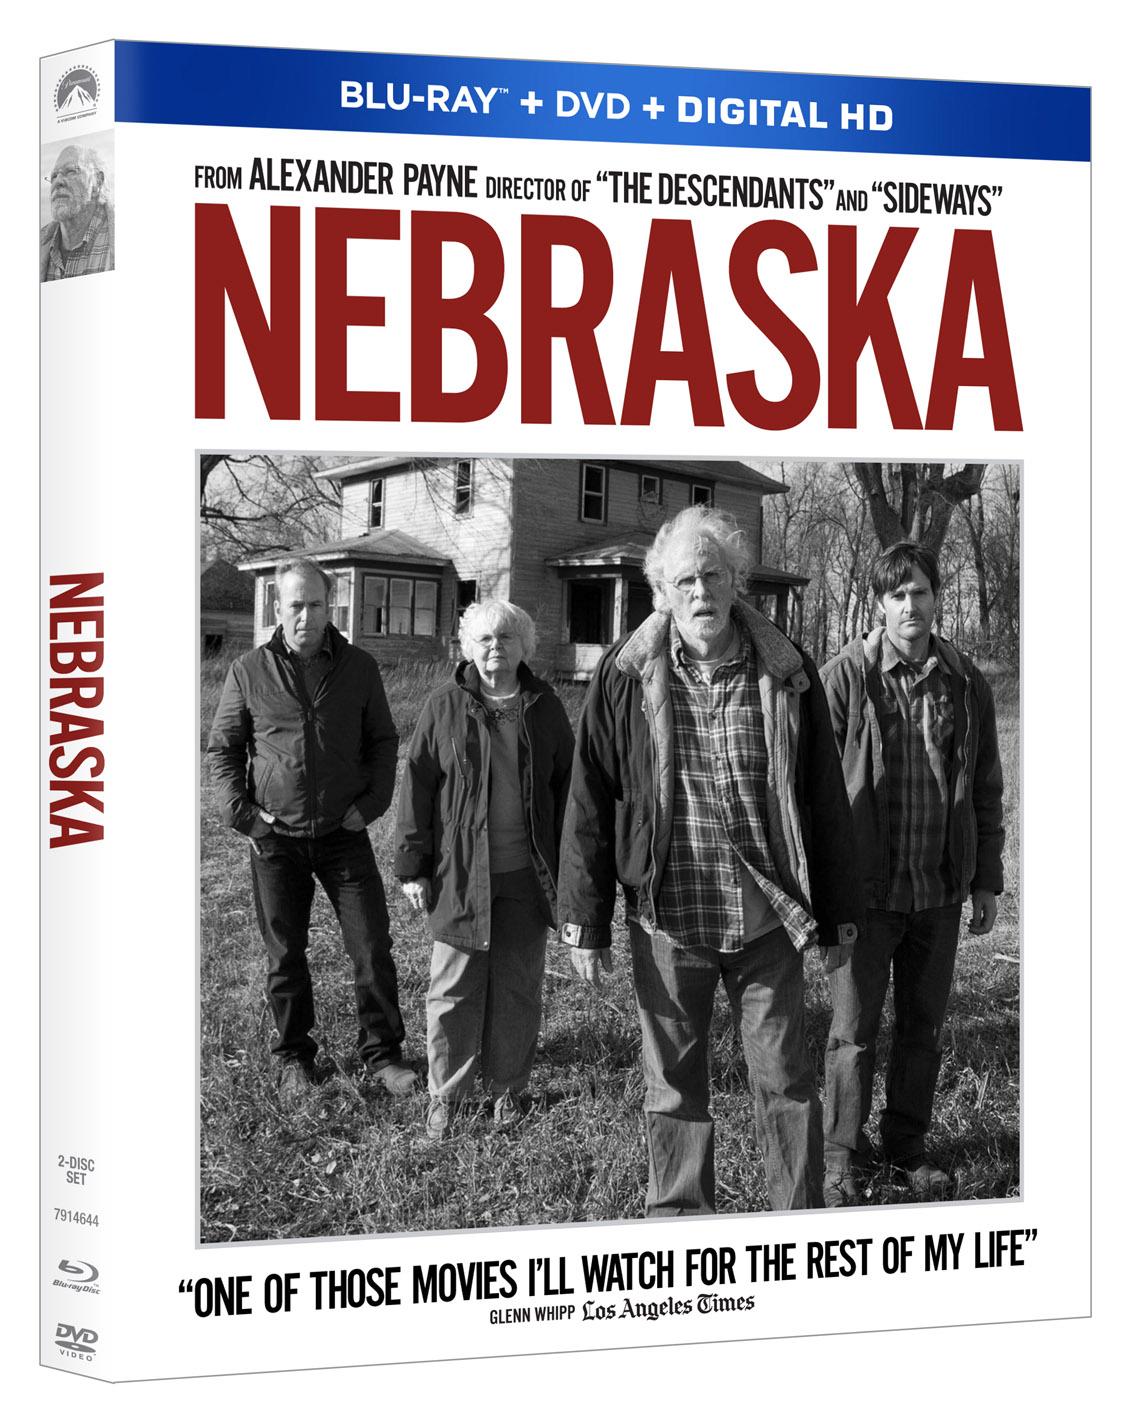 Nebraska Blu-ray Review